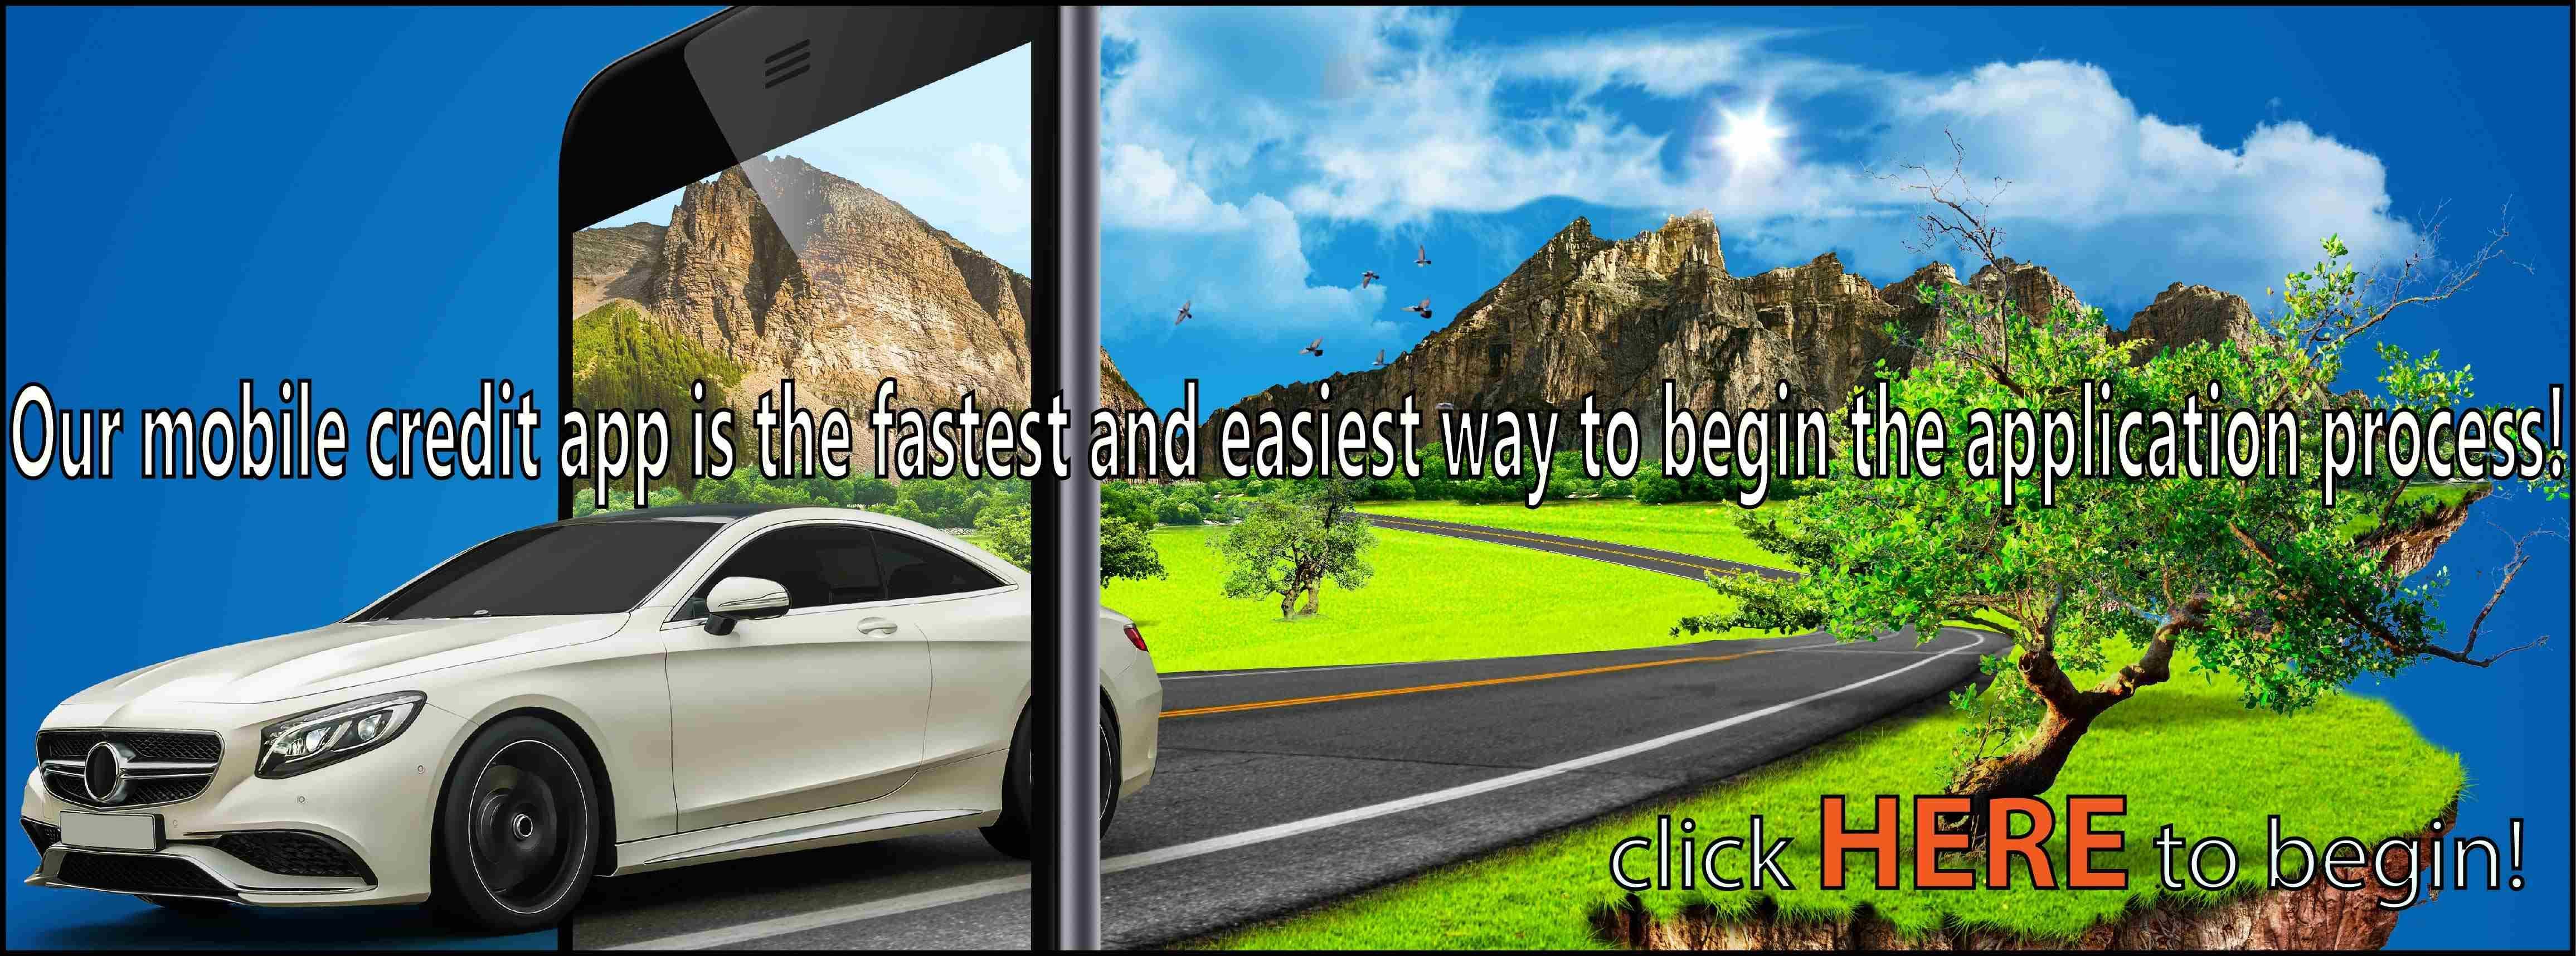 app home credit dover md used dealerships in bmw mobil intellicar dealers de here pay slideshow car buy cars